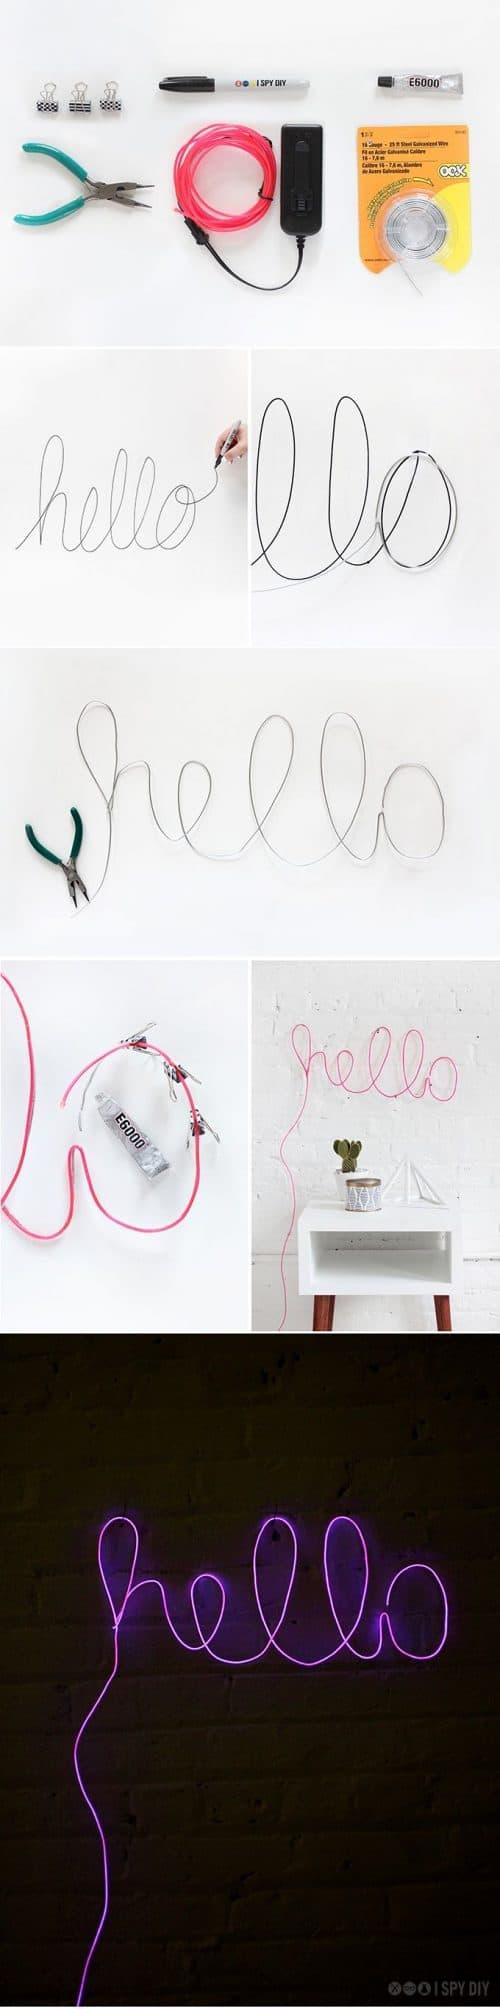 Neon | Neon Type – Hello